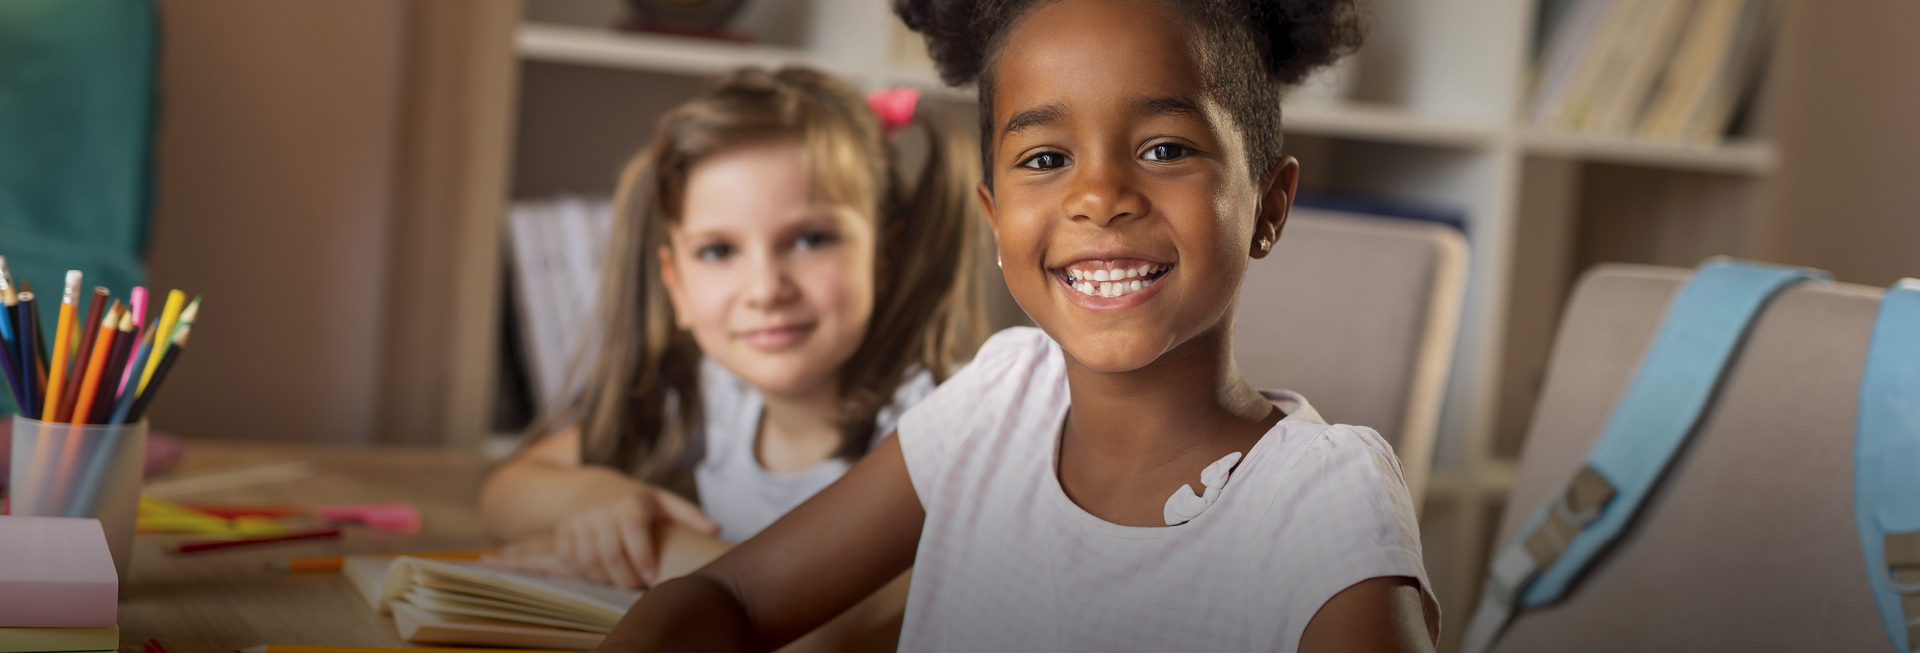 Smiling kids at school